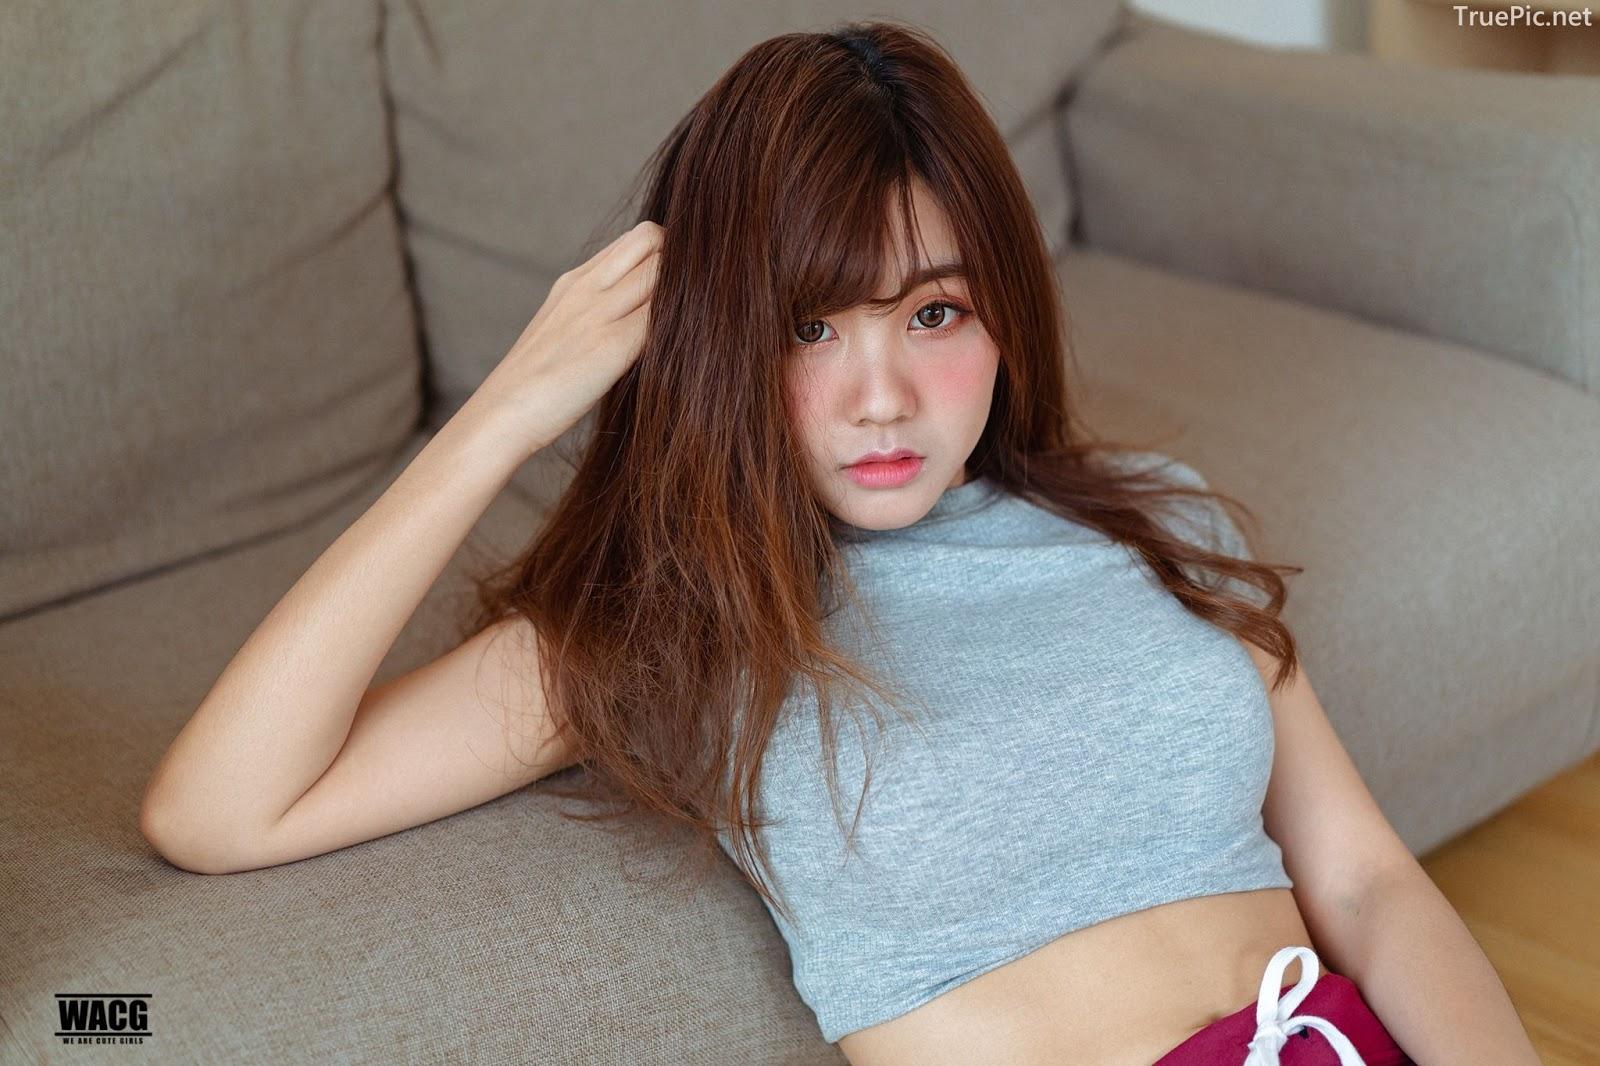 Thailand-cute-girl-Koi-The-Glass-Girls-Indoor-Croptop-TruePic.net- Picture-5